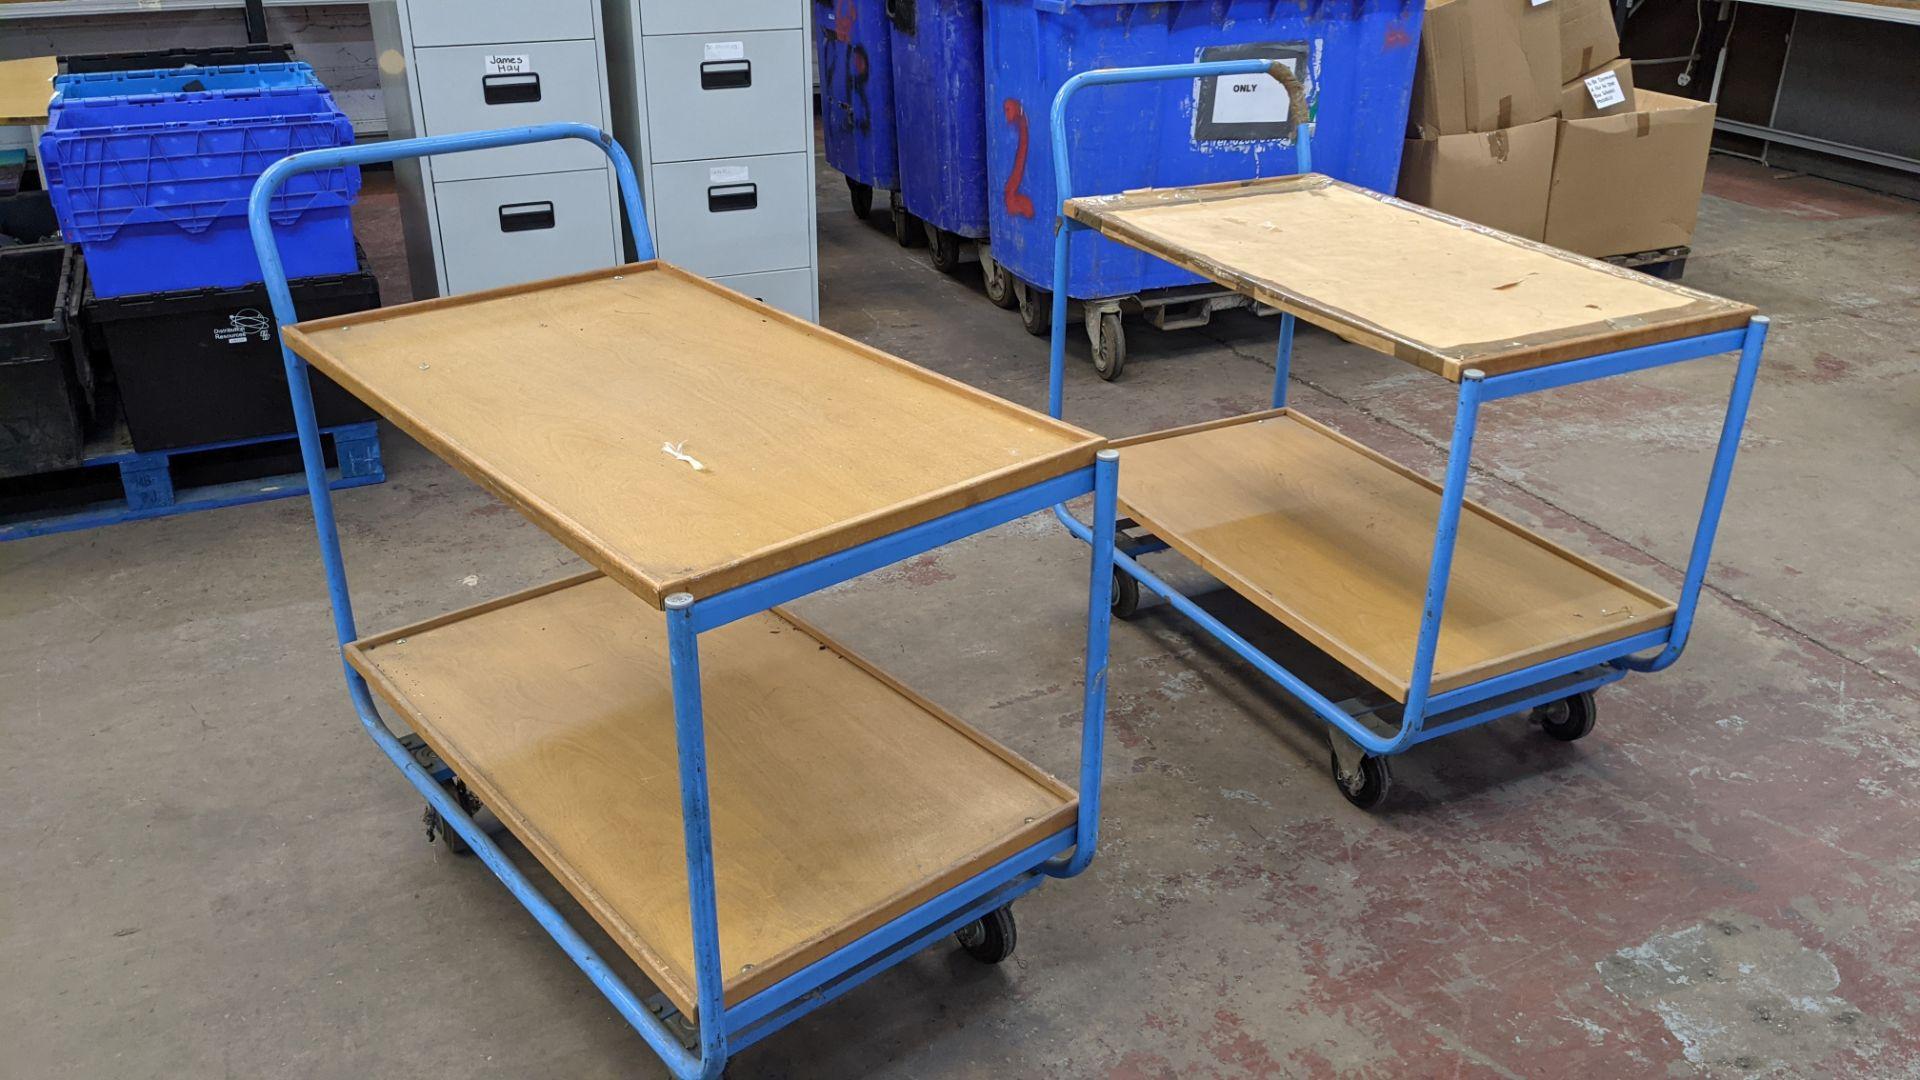 2 mobile twin shelf trolleys with lockable wheels - Image 7 of 7